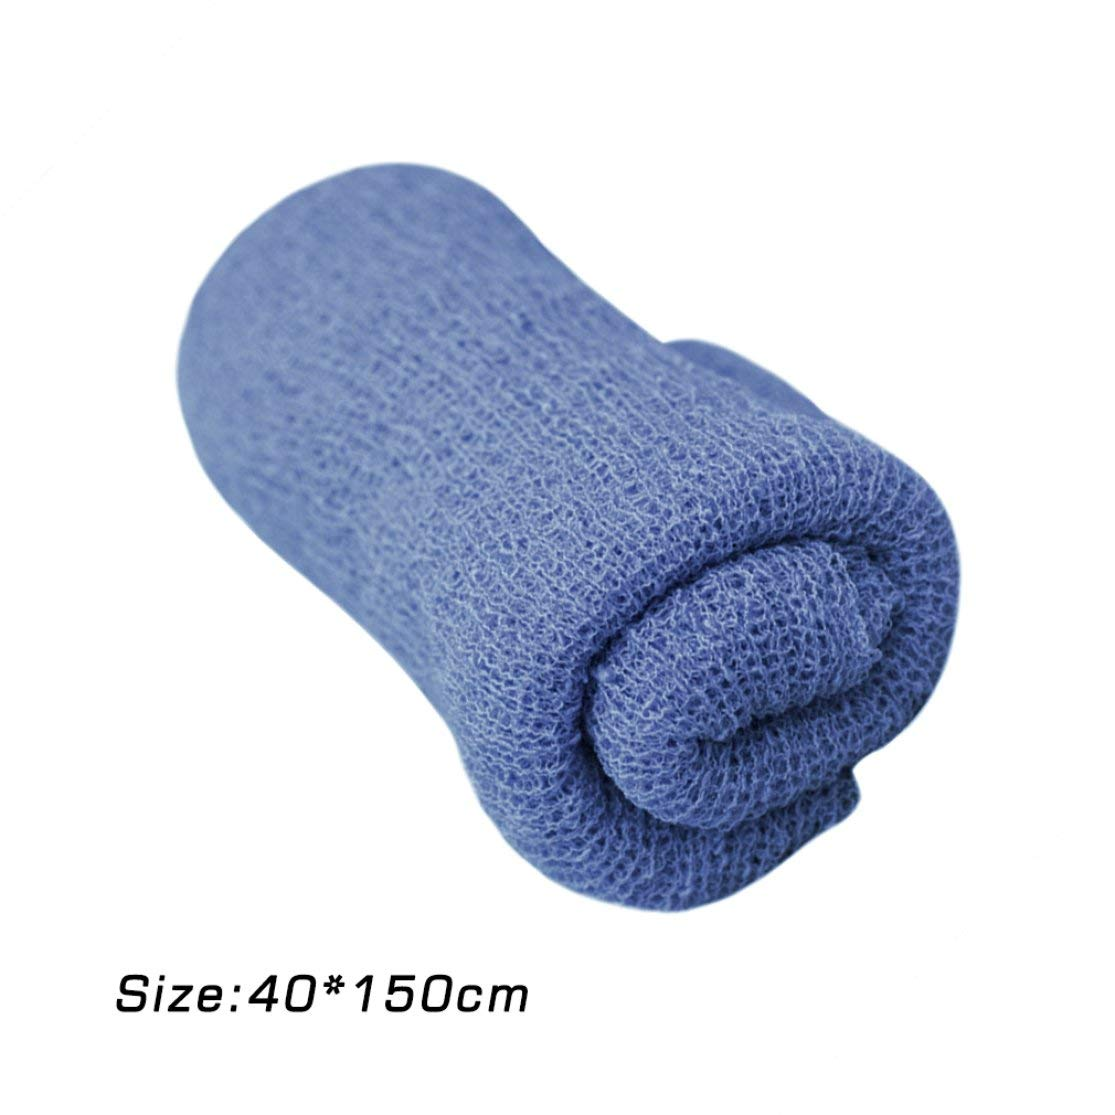 150cm Baby Photography Props Blanket Rayon Stretch Knit Wrap Newborn Photo Wraps Hammock Swaddling Padding Nubble Wraps 40